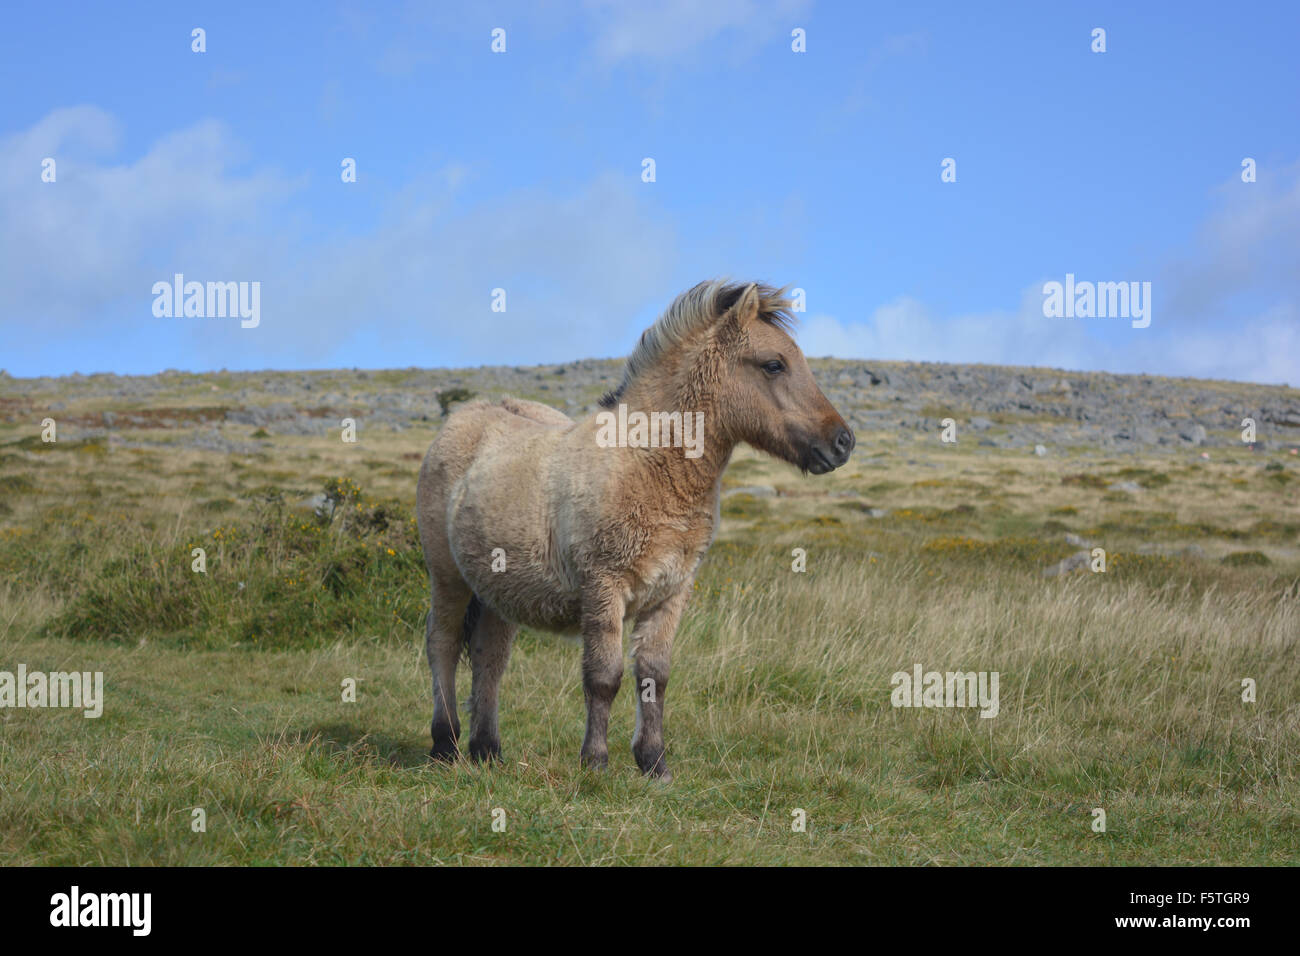 Dartmoor pony, Dartmoor National Park, Devon, England - Stock Image